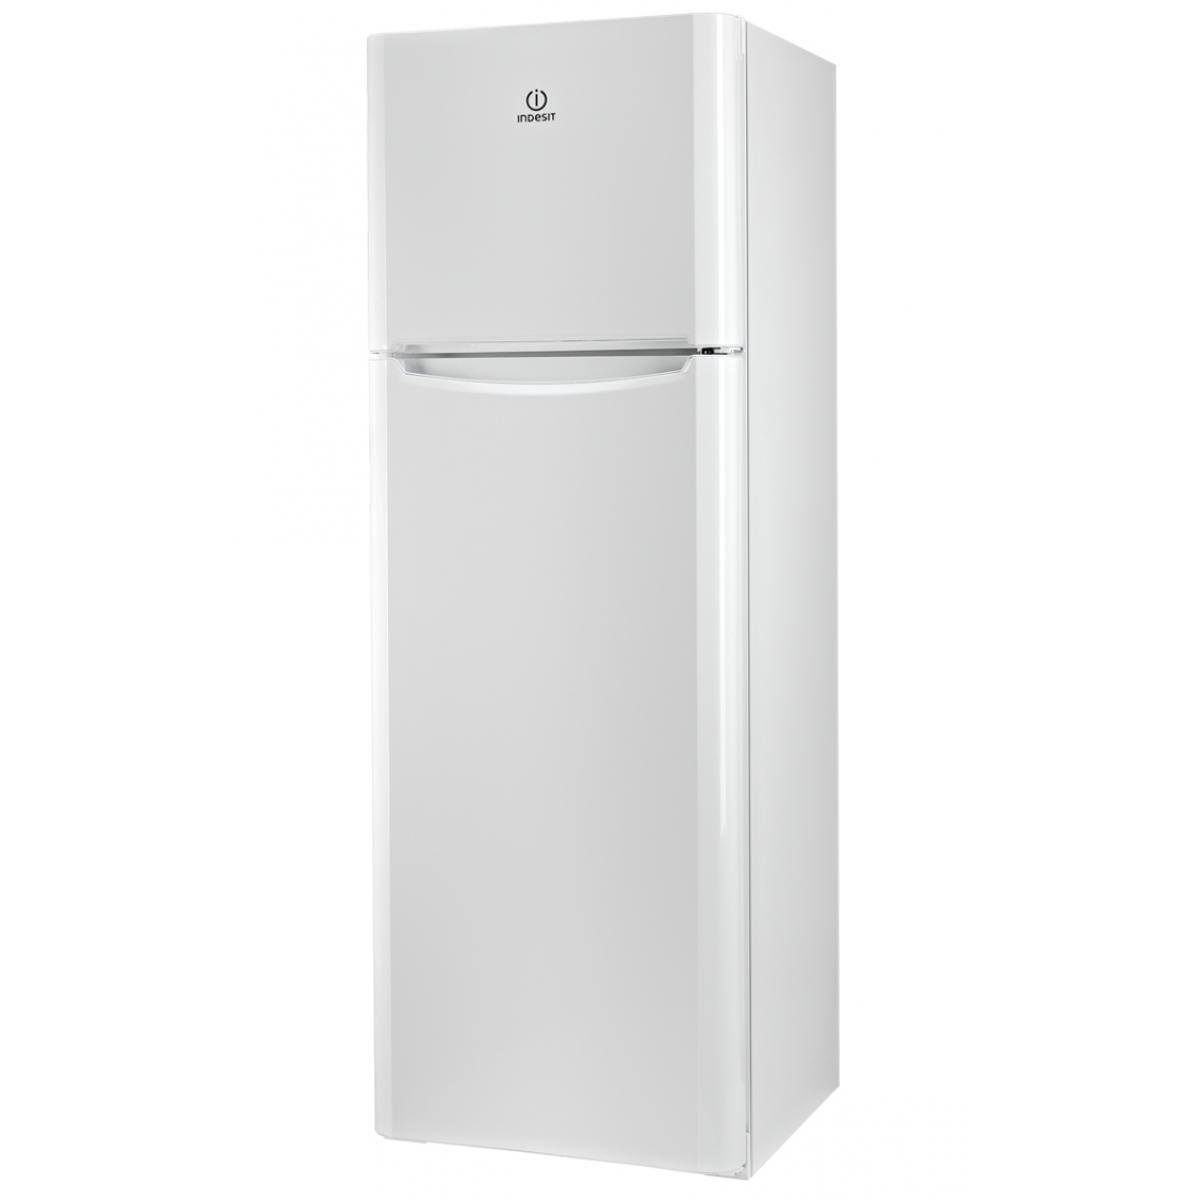 Indesit Réfrigérateur 2 portes INDESIT, TIAA12V1